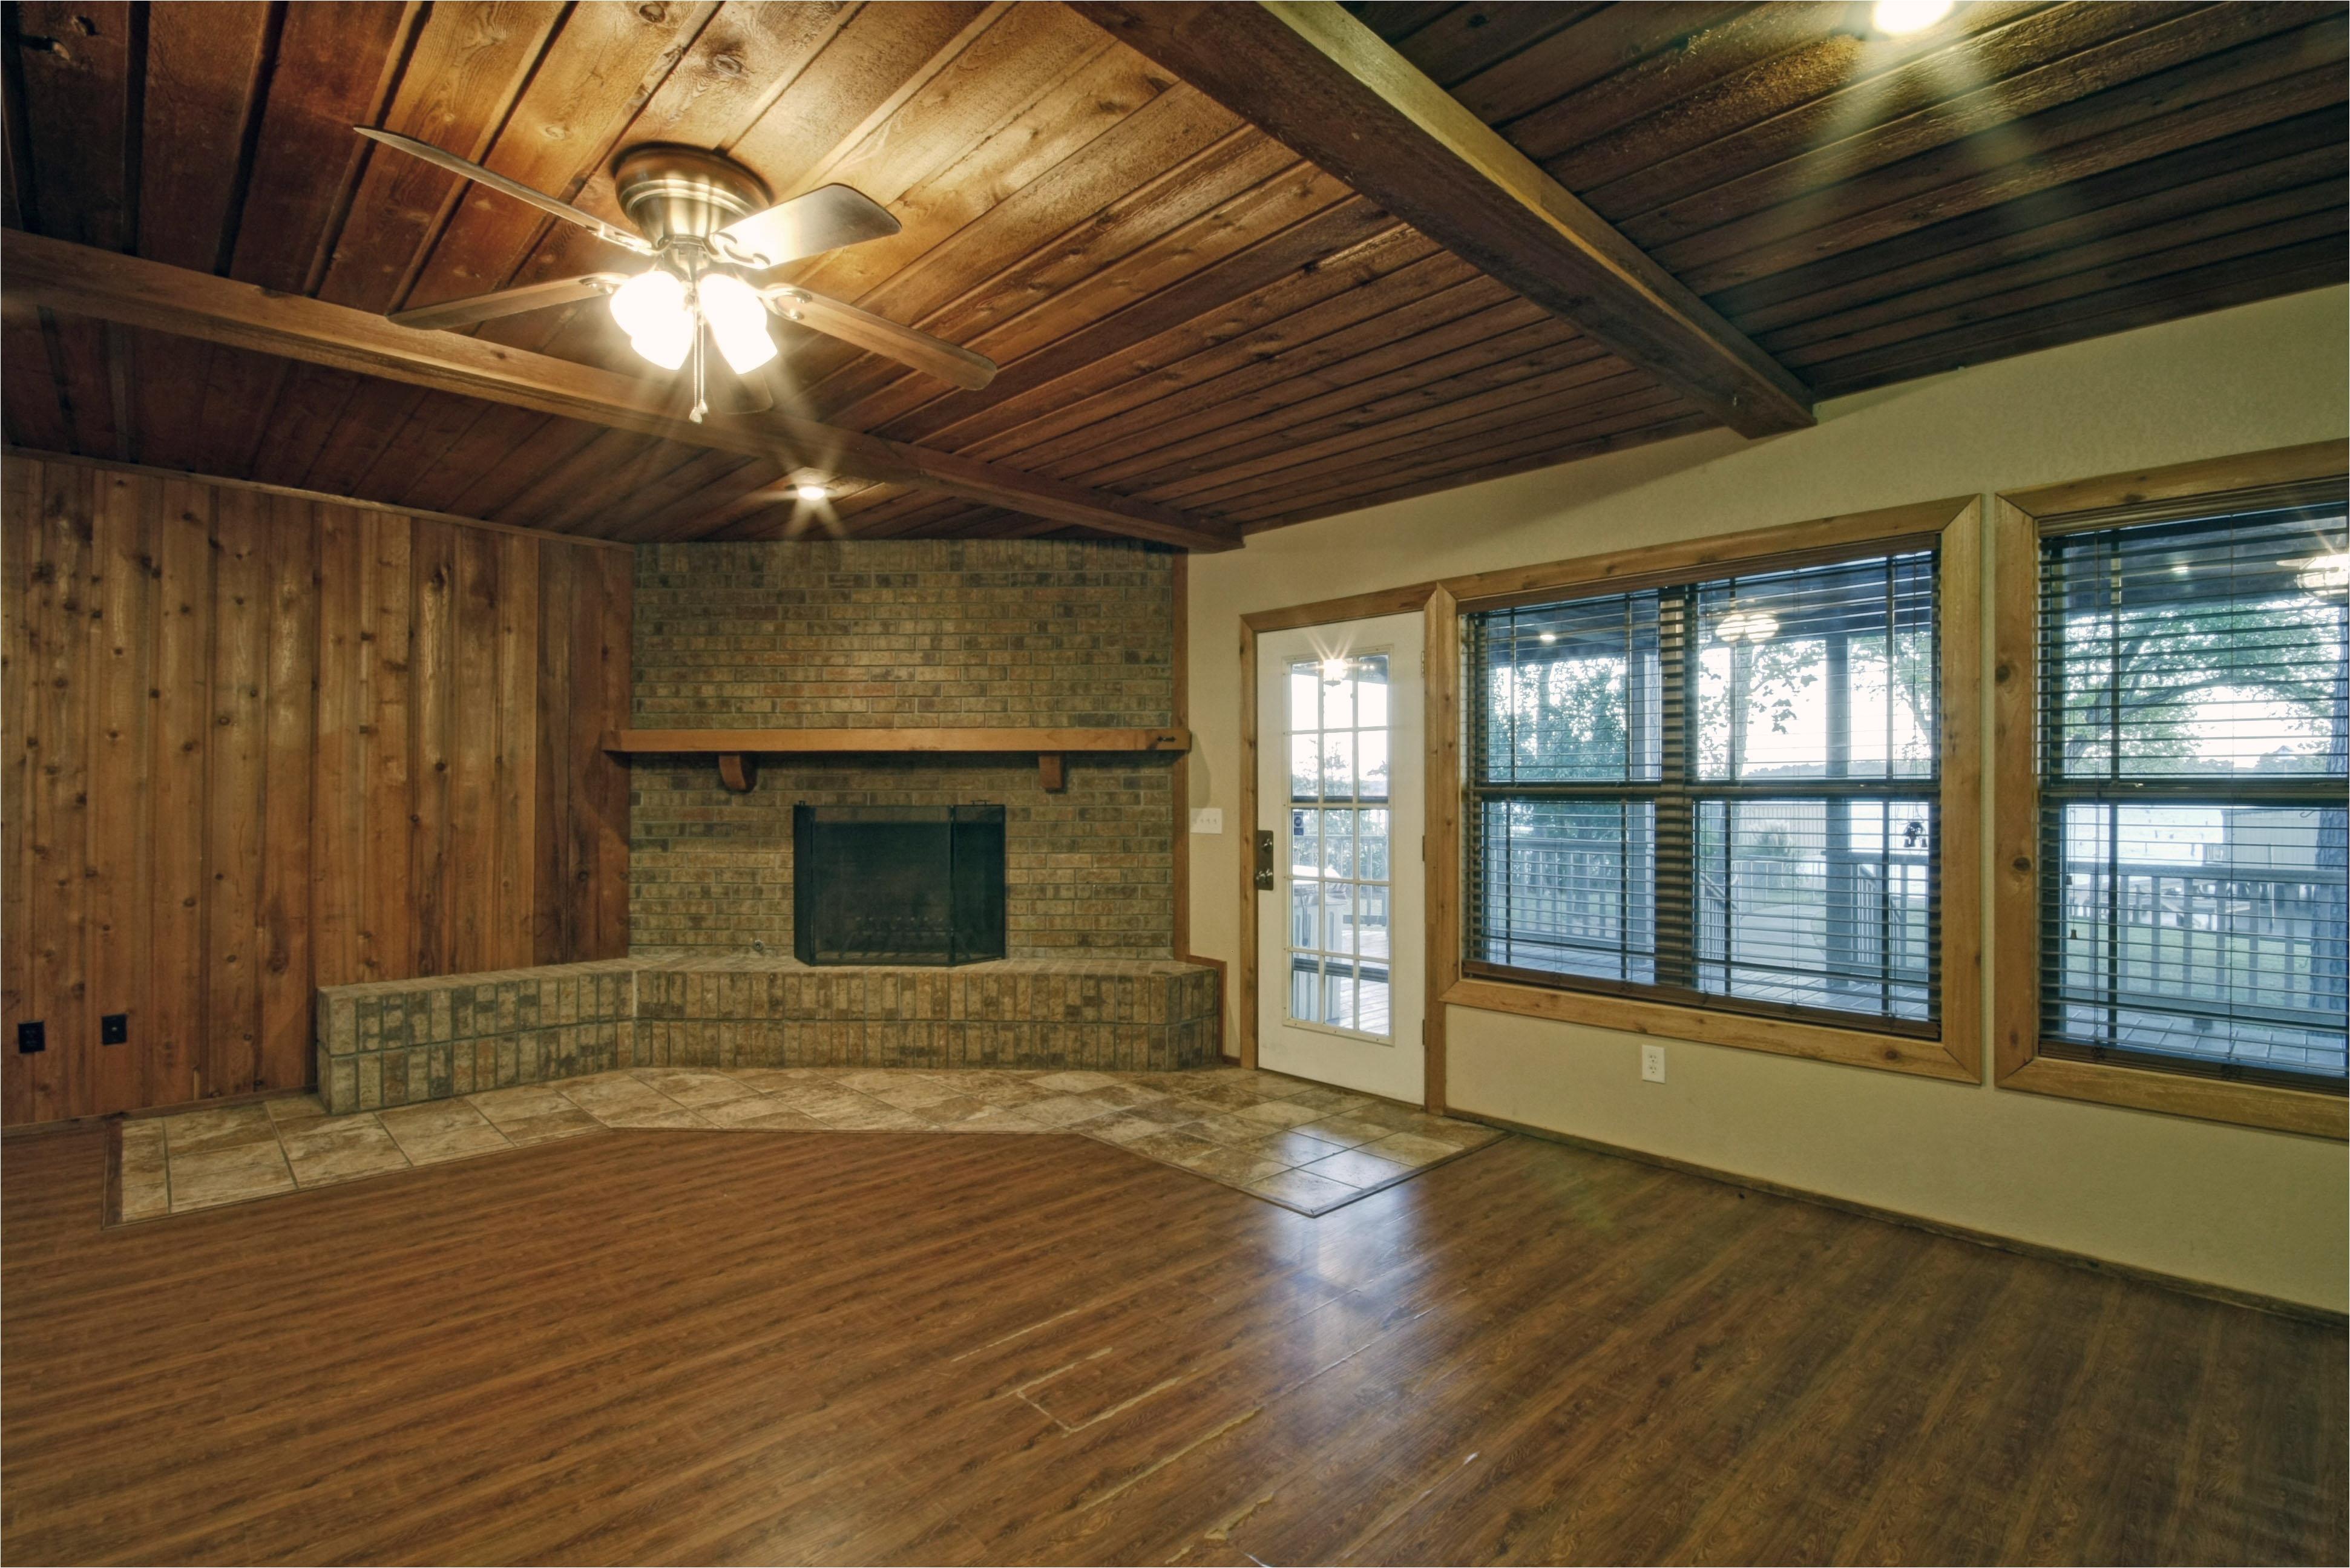 Cook Flooring Longview Tx Ng 23 Lake Cherokee Longview Tx 75603 Find Longview Homes for Sale